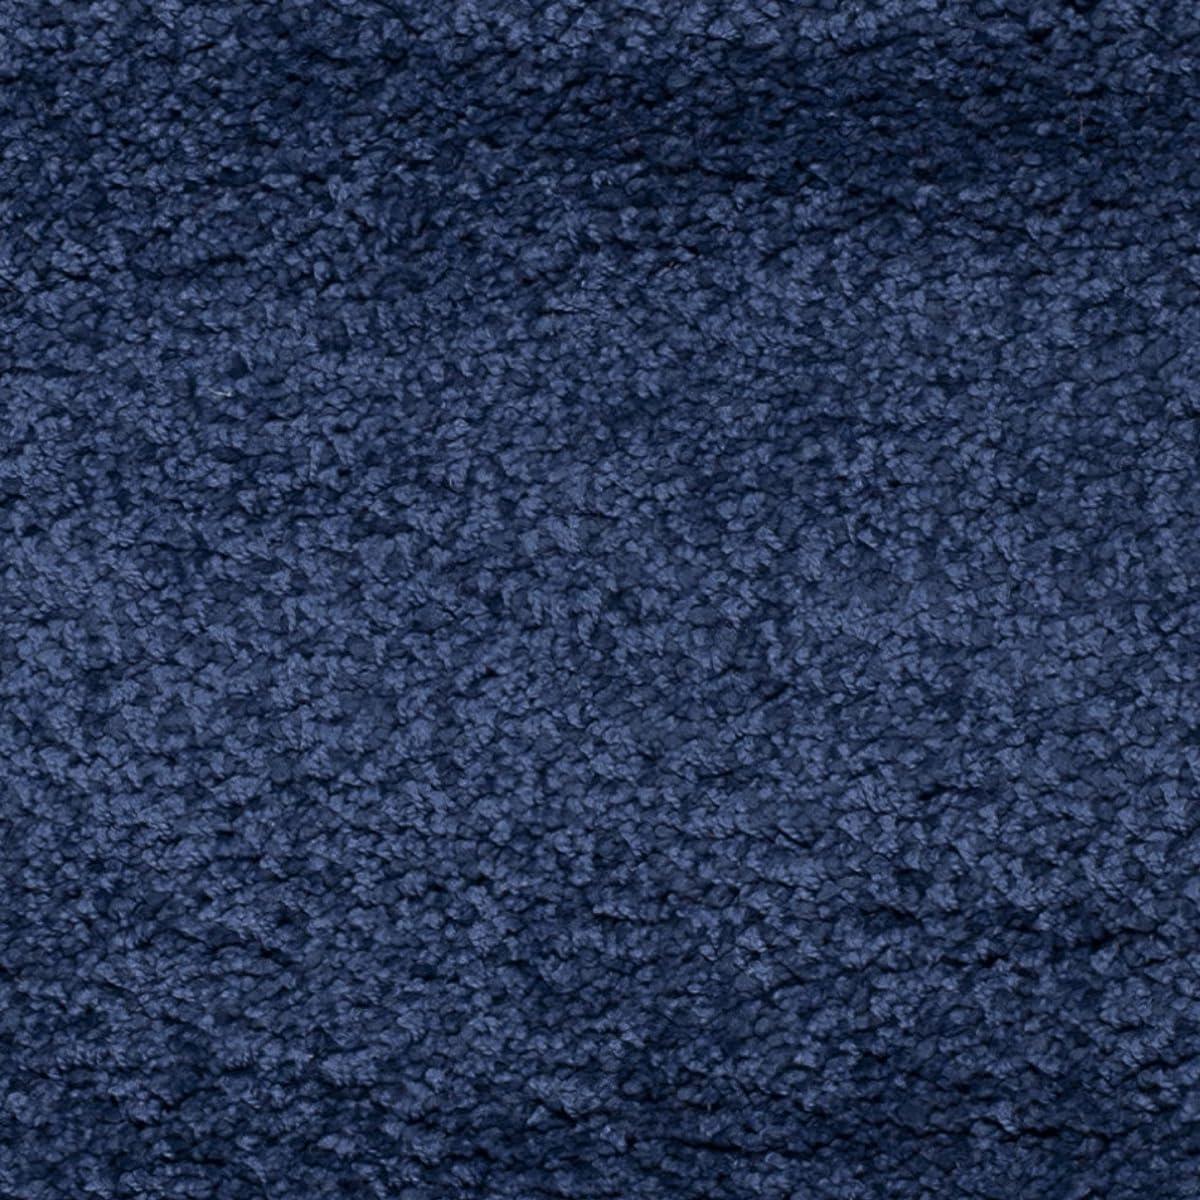 Safavieh Milan Shag Collection SG180-7070 Navy Area Rug (3' x 5')